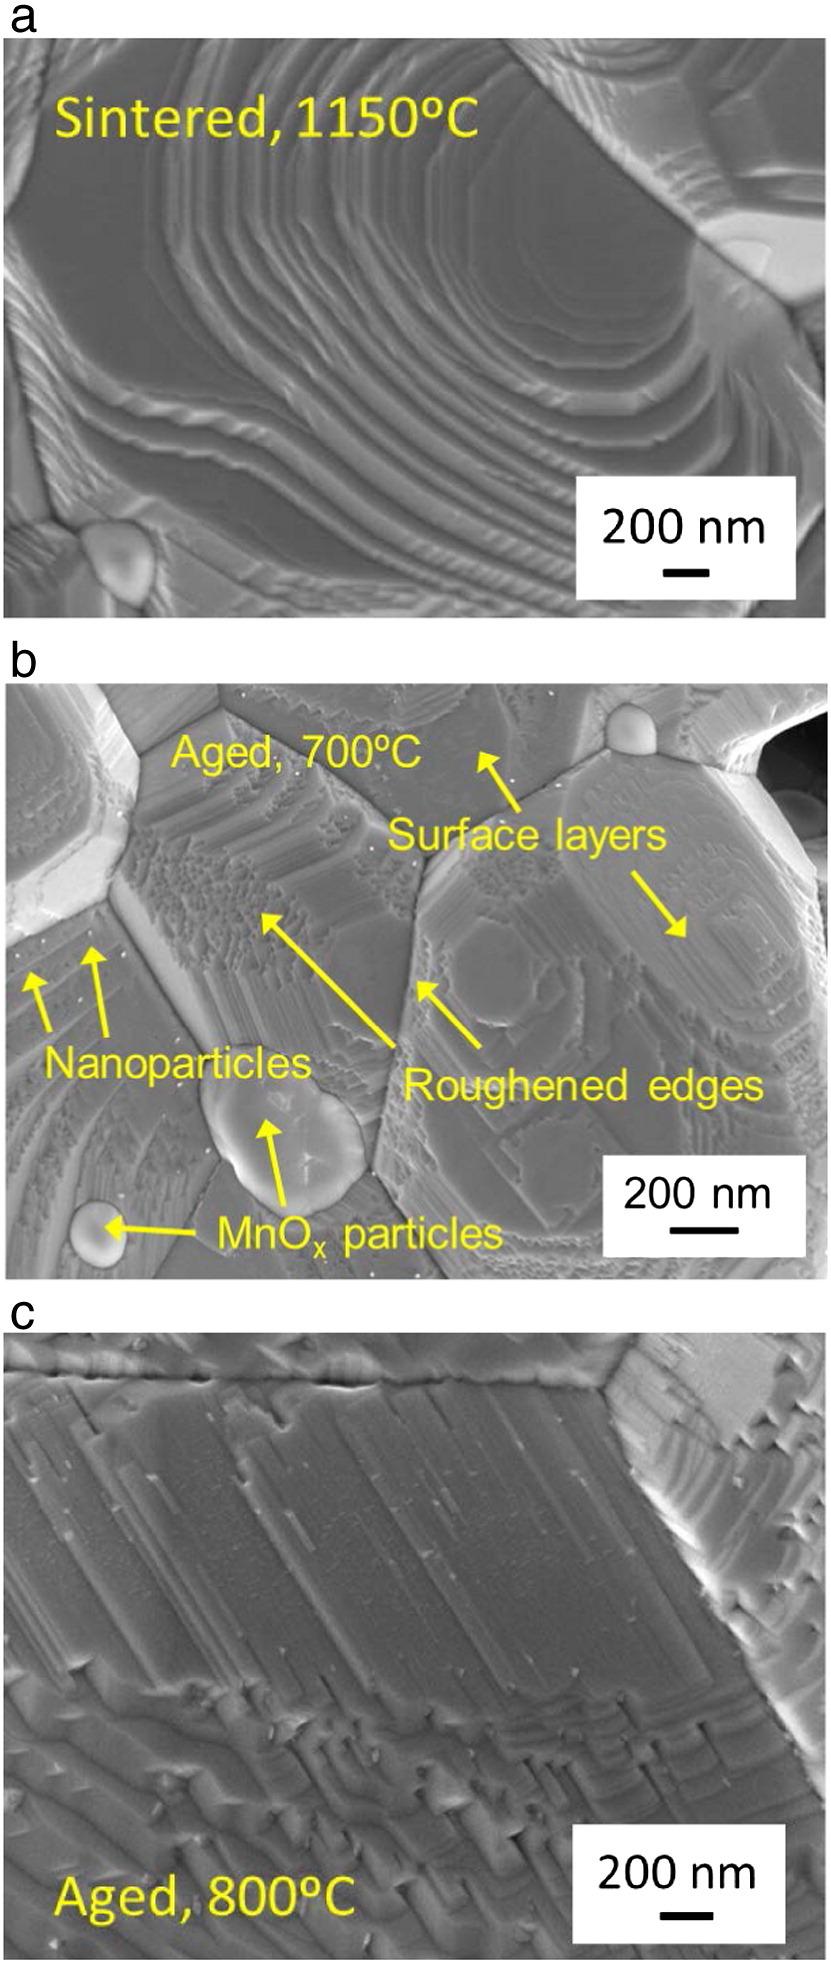 SEM micrographs of dense LSM pellet